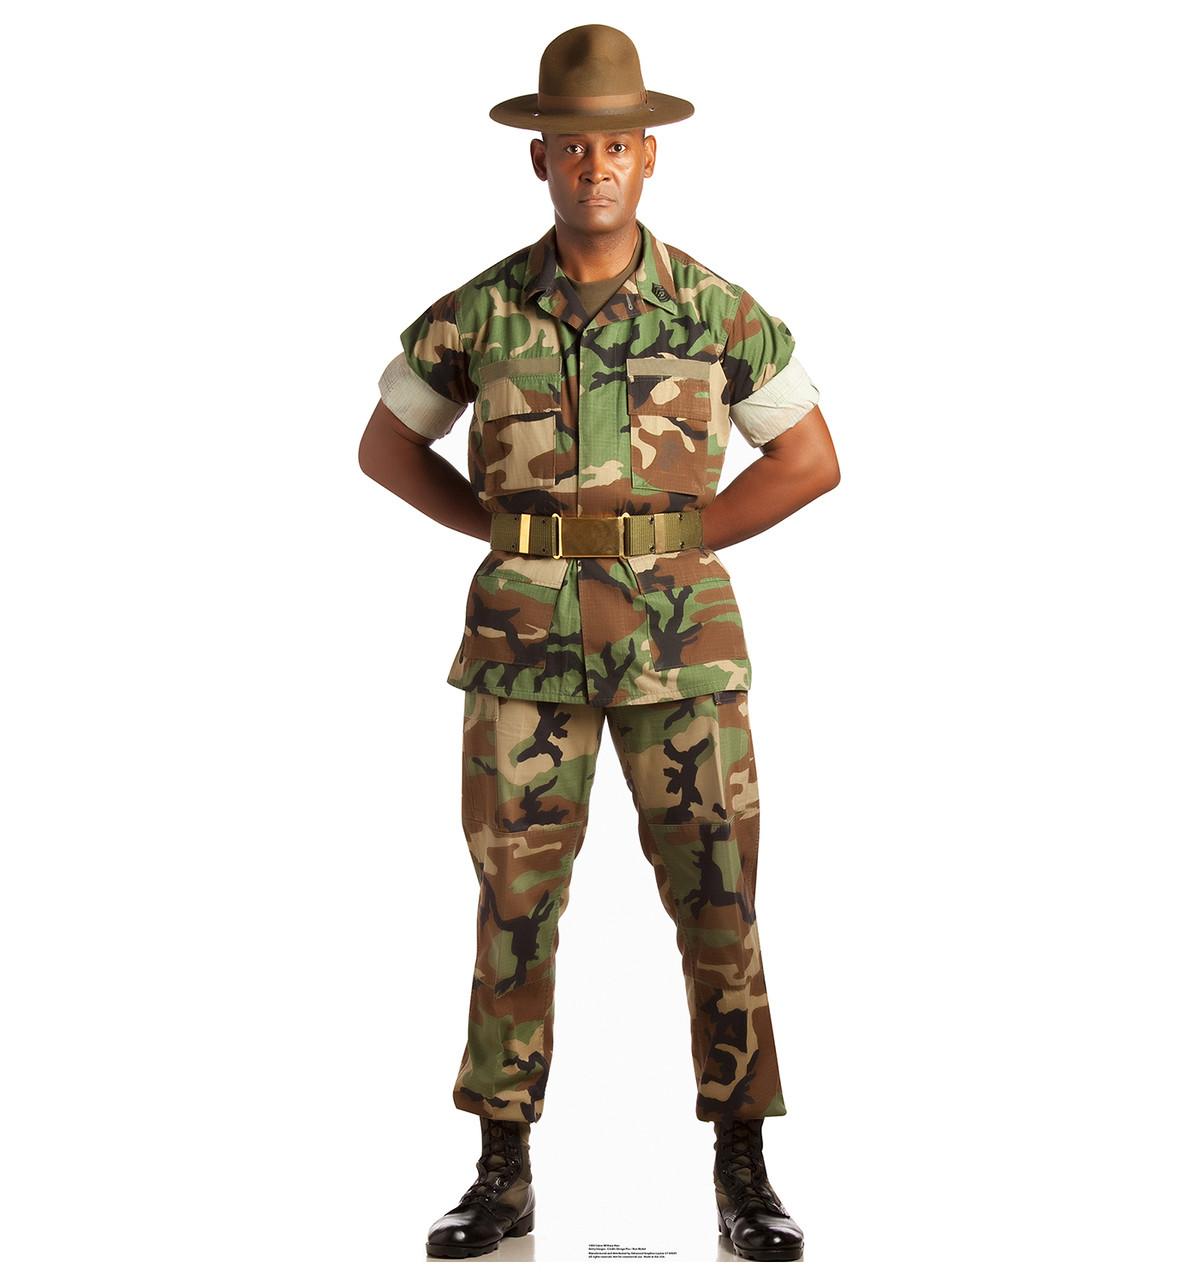 Life-size Camo Military Man Cardboard Standup |Cardboard Cutout